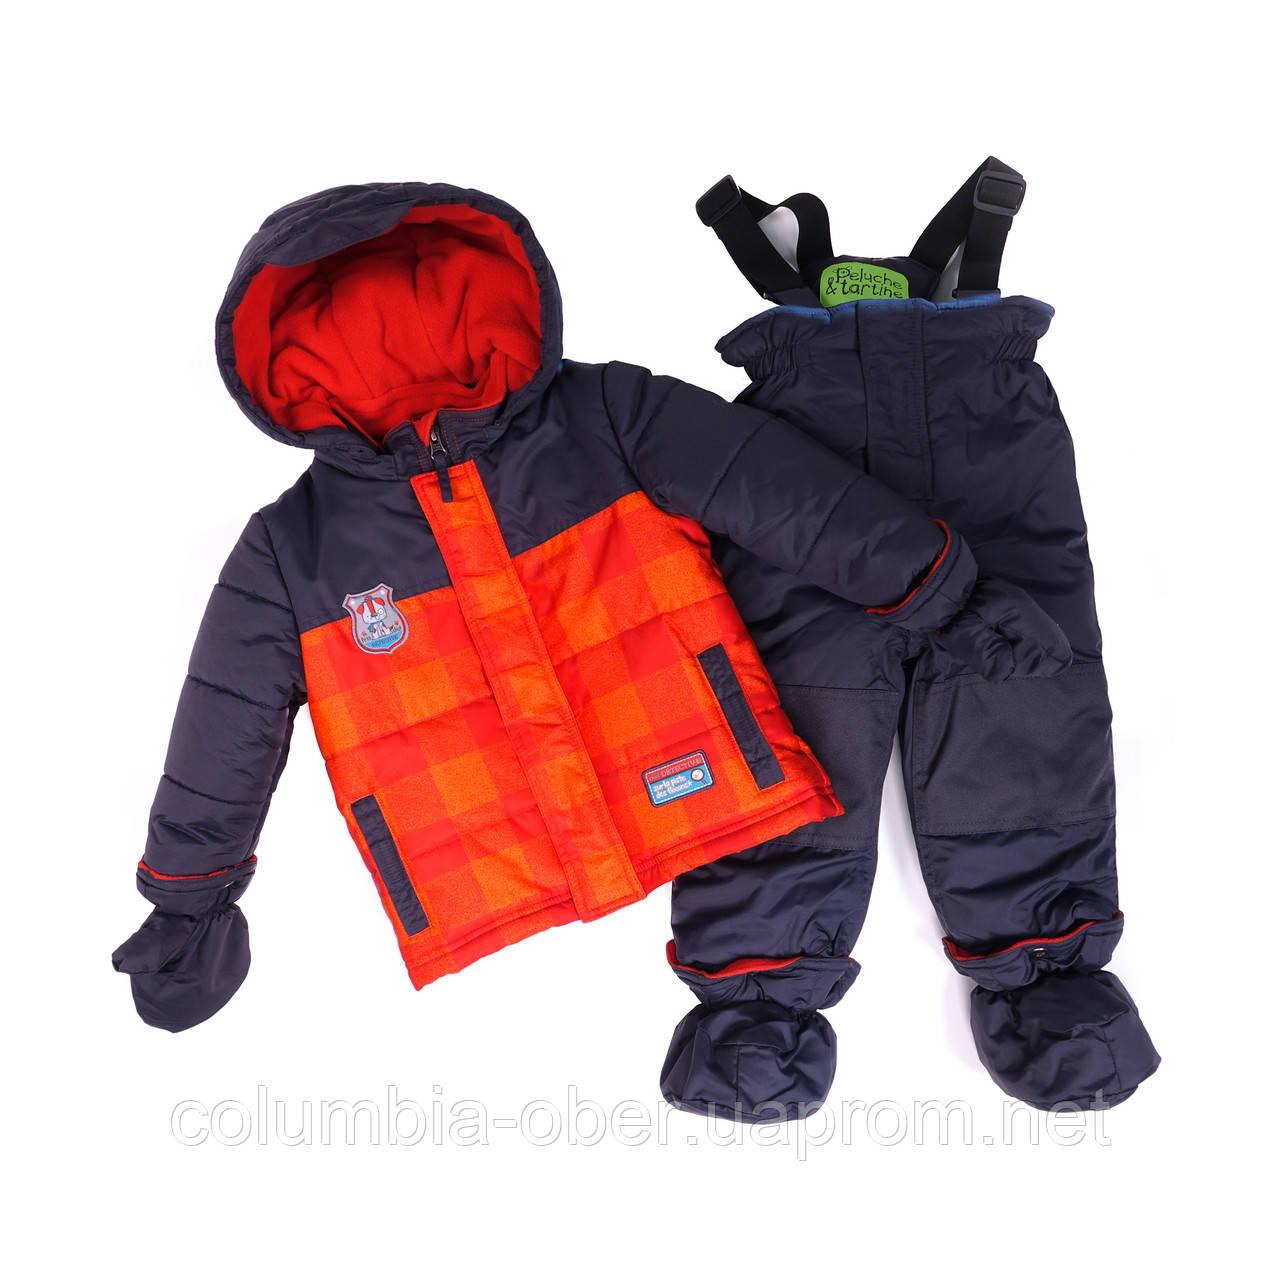 Зимний костюм для мальчика PELUCHE 23 BG M F16 Chili. Размеры 12 - 24 мес.